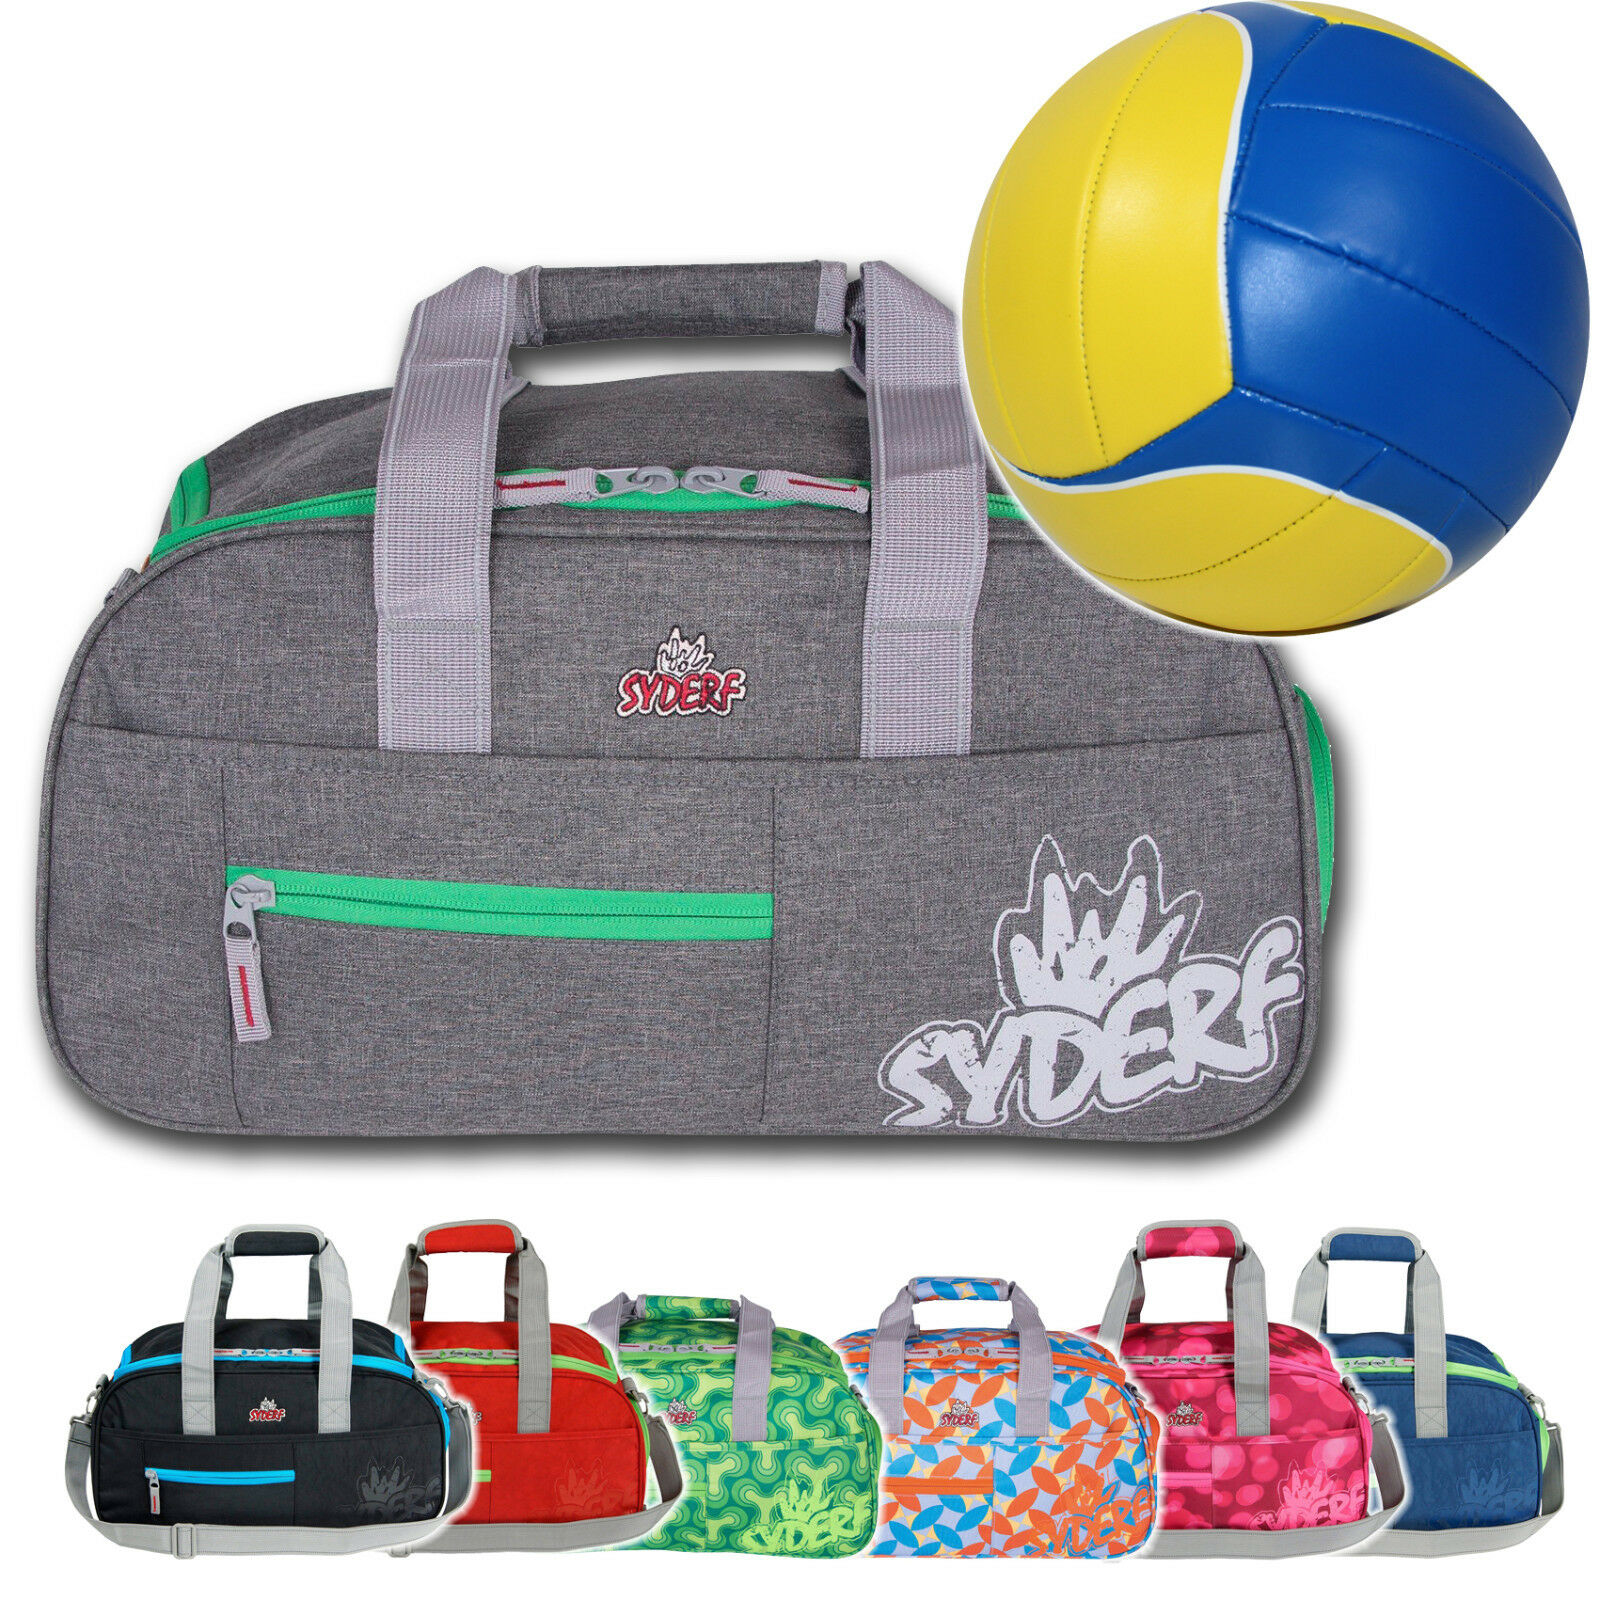 92e7e2503bf6f SPORTTASCHE + VOLLEYBALL Mädchen Junge Kinder Sport Schule Syderf five ~SY3  100+